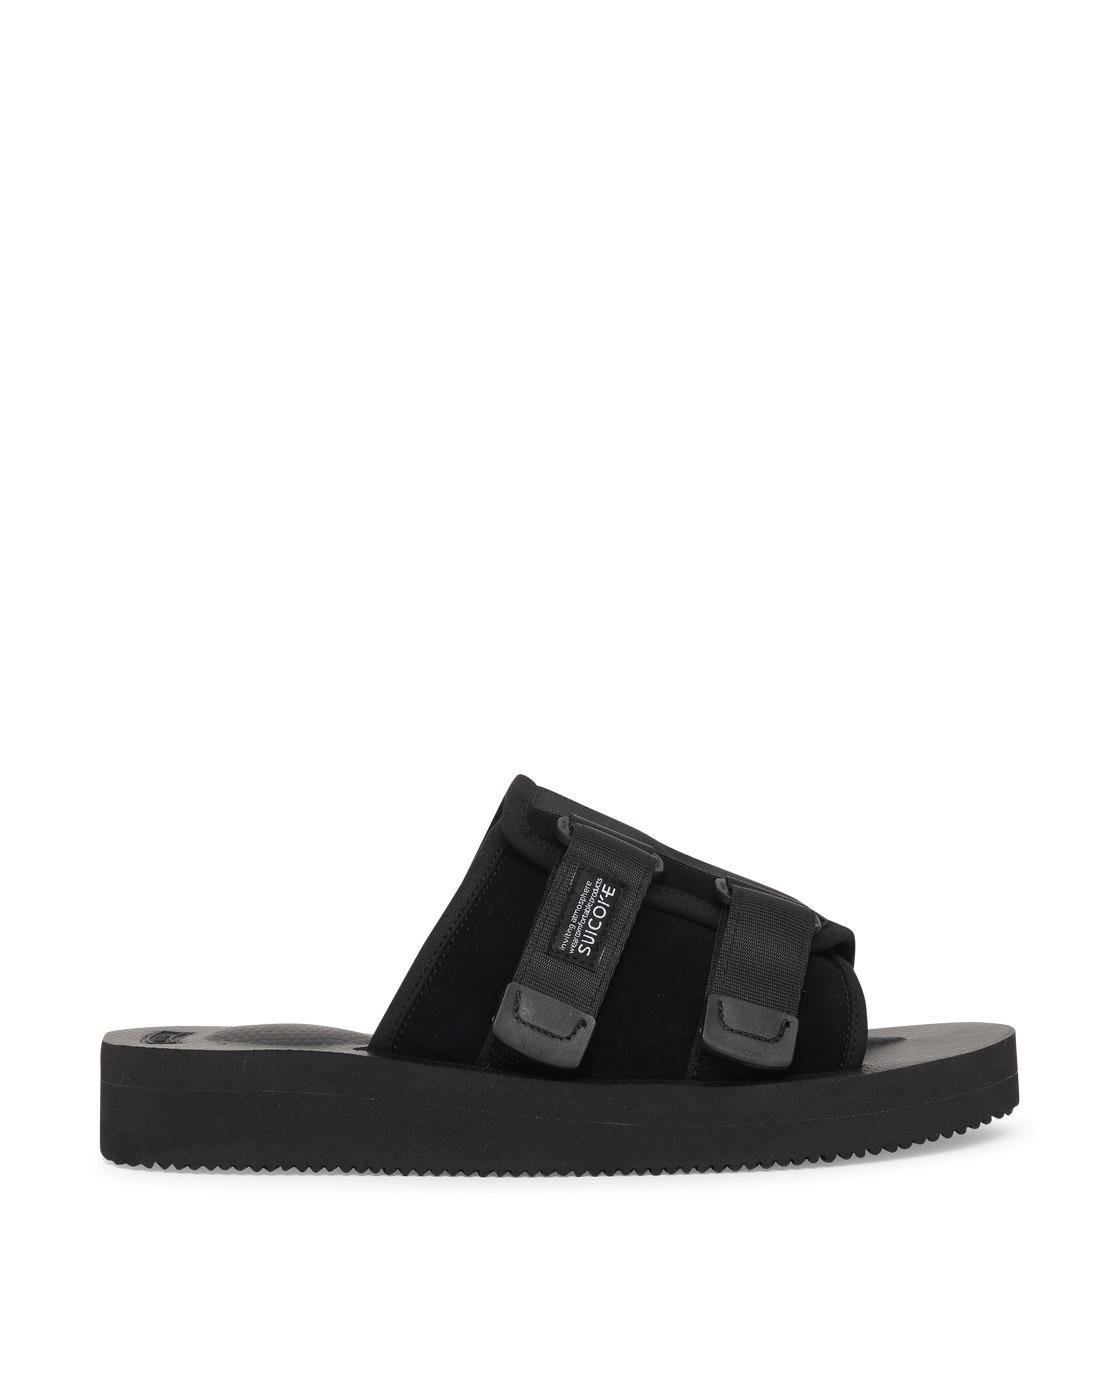 Photo: Suicoke Kaw Vs Sandals Black